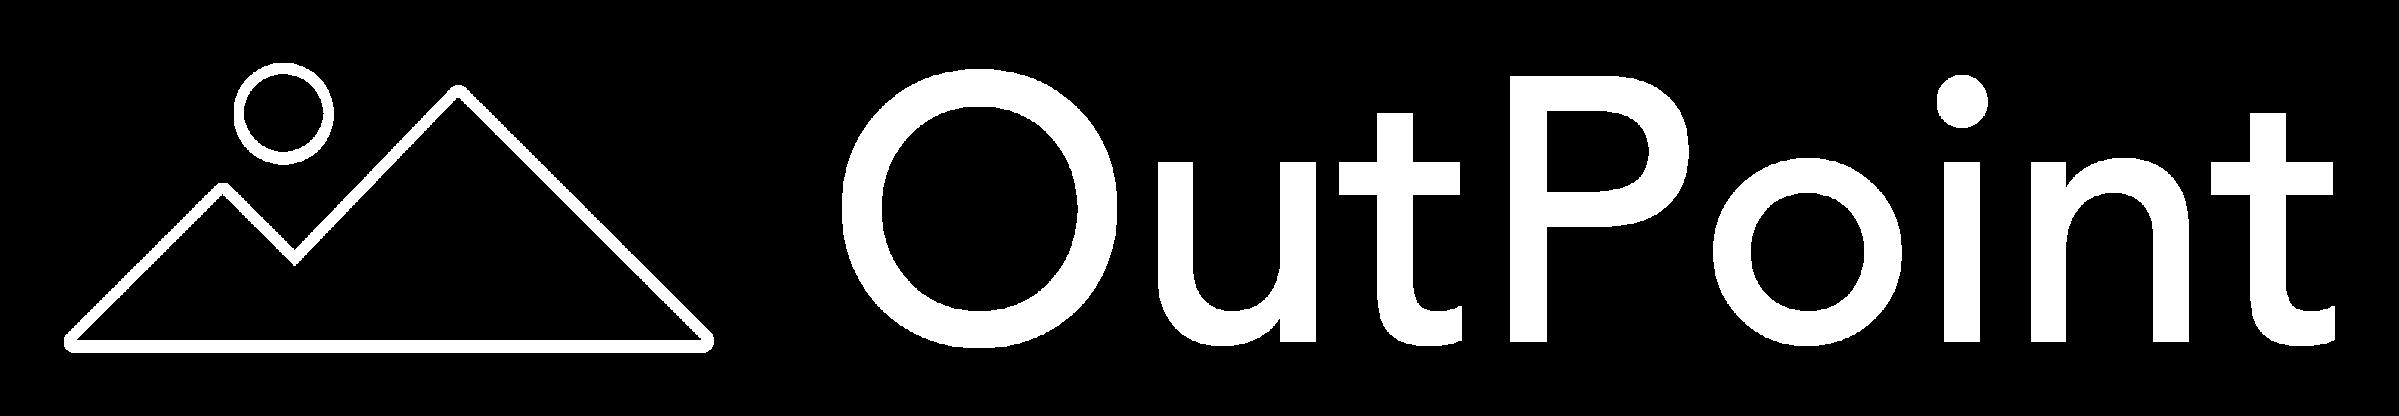 OutPoint logo